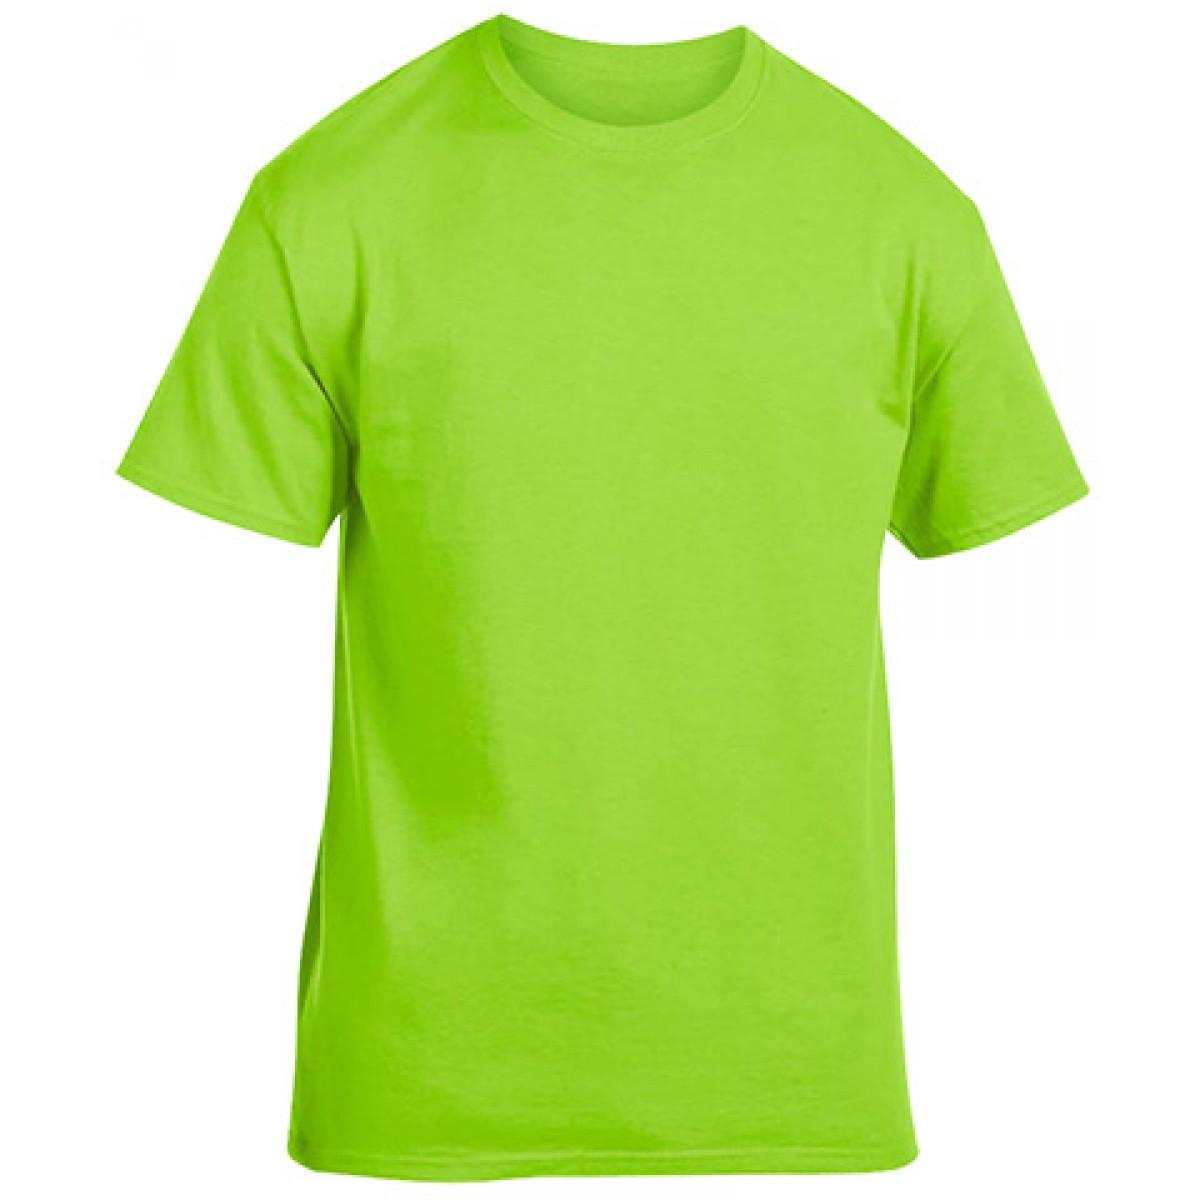 Soft 100% Cotton T-Shirt-Lime Green-3XL